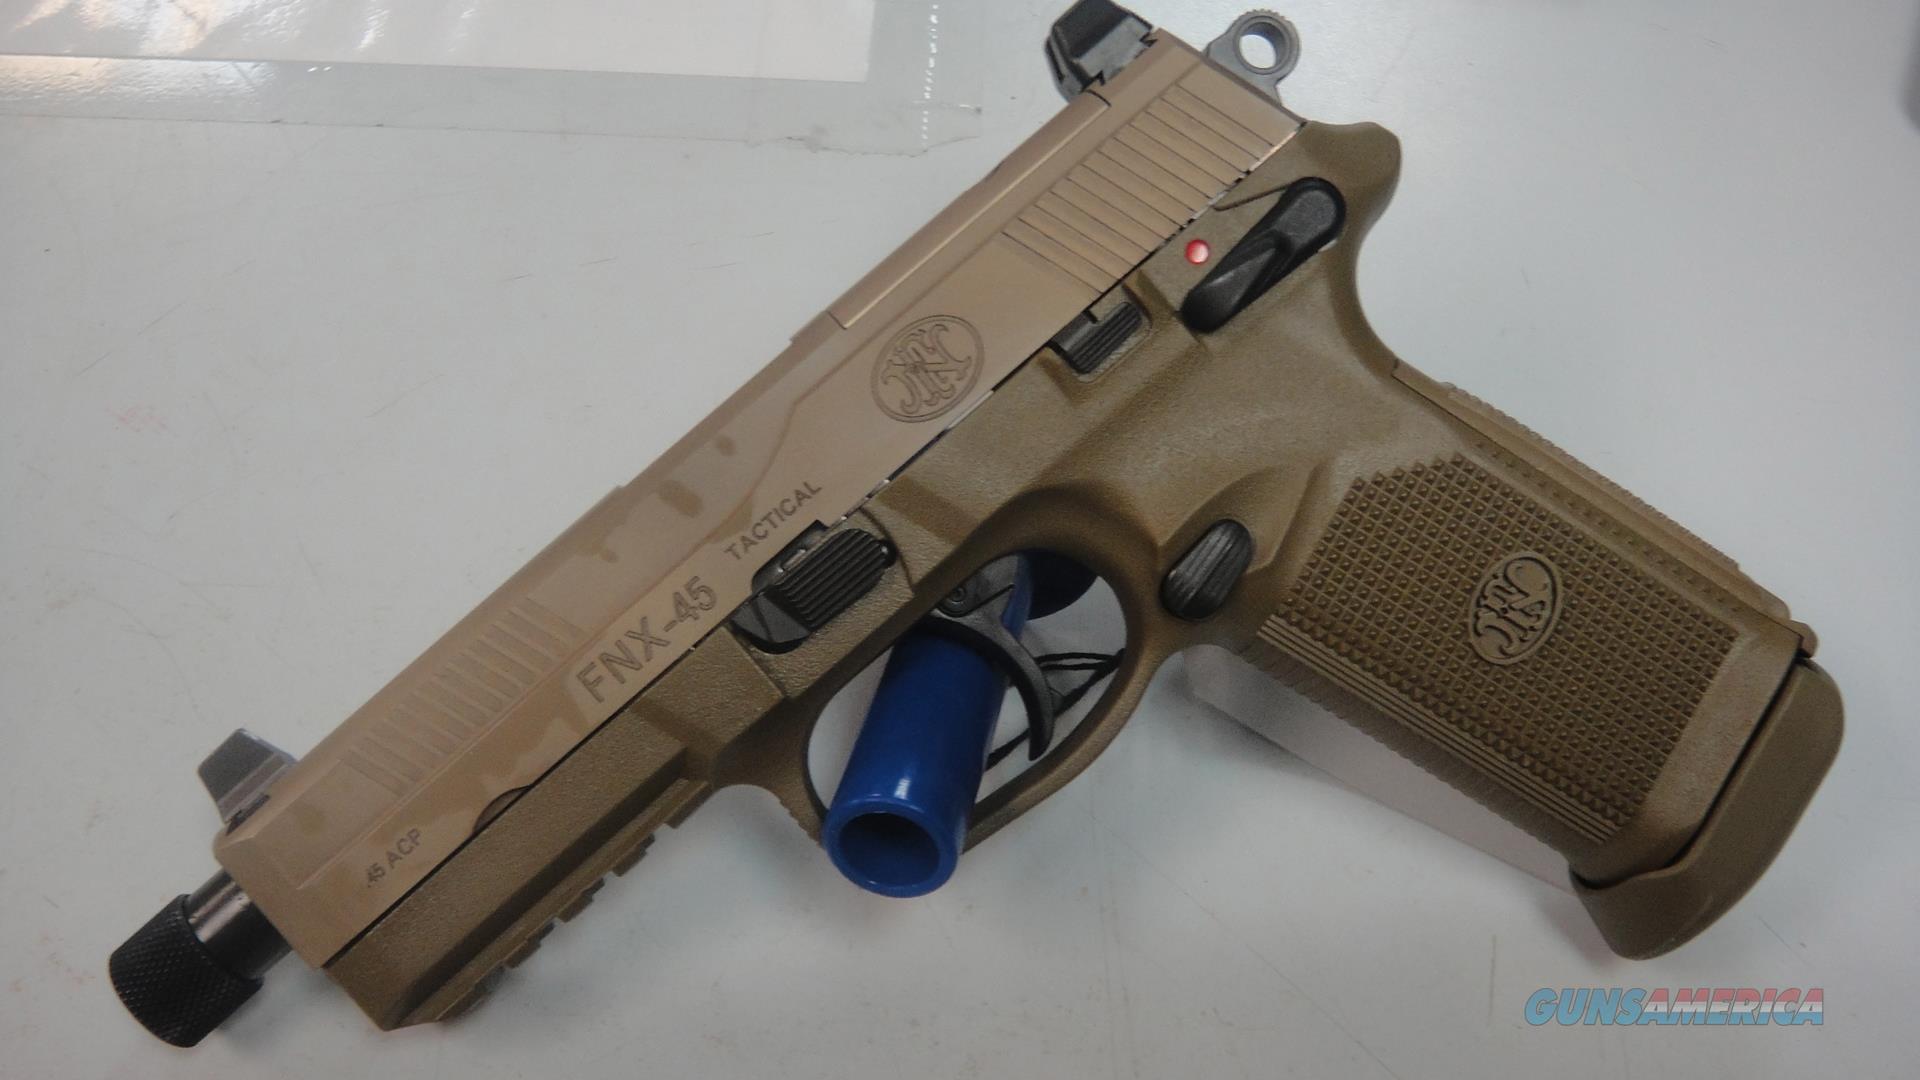 FNH FNX-45 Tactical  Guns > Pistols > FNH - Fabrique Nationale (FN) Pistols > FNX